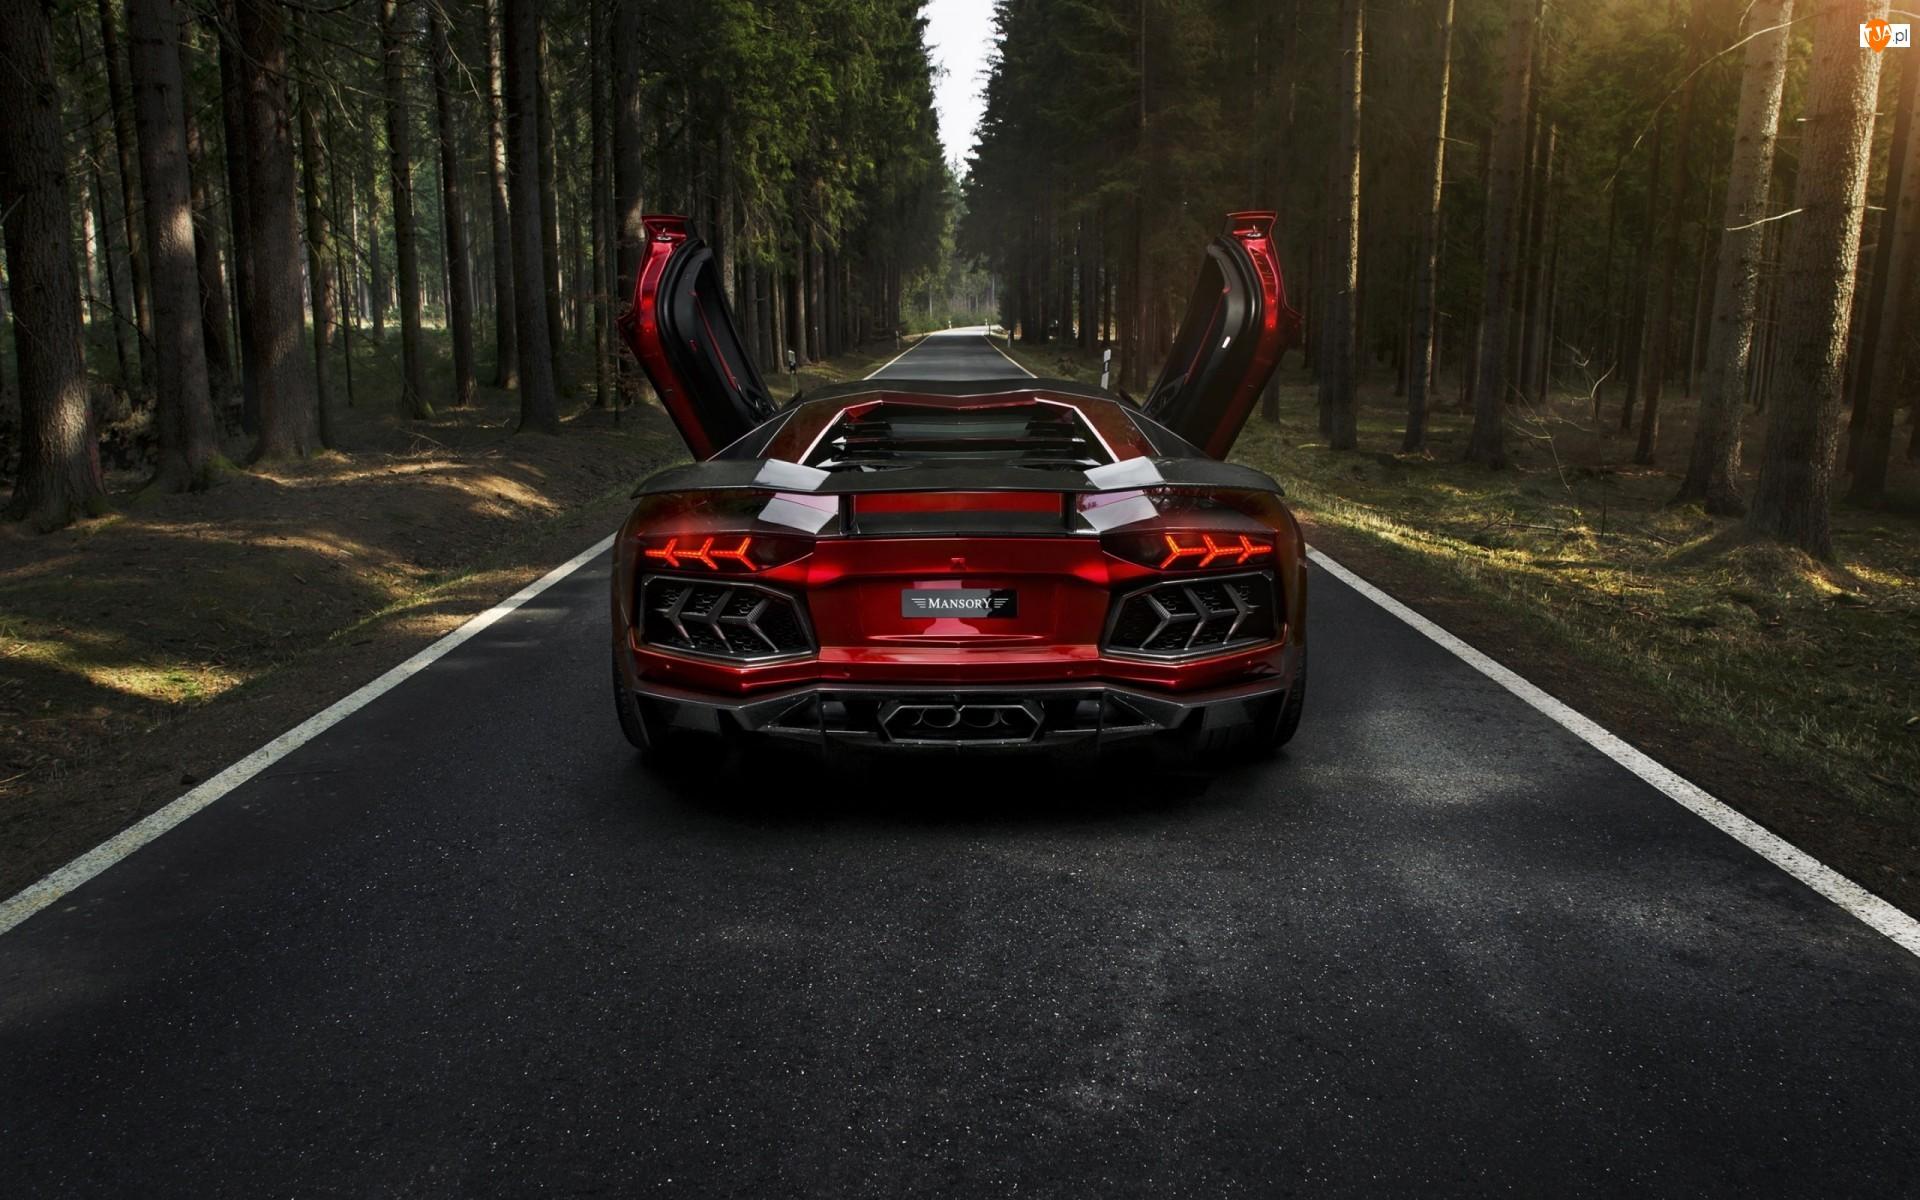 Lamborghini Aventador LP700-4 Mansory, 2012